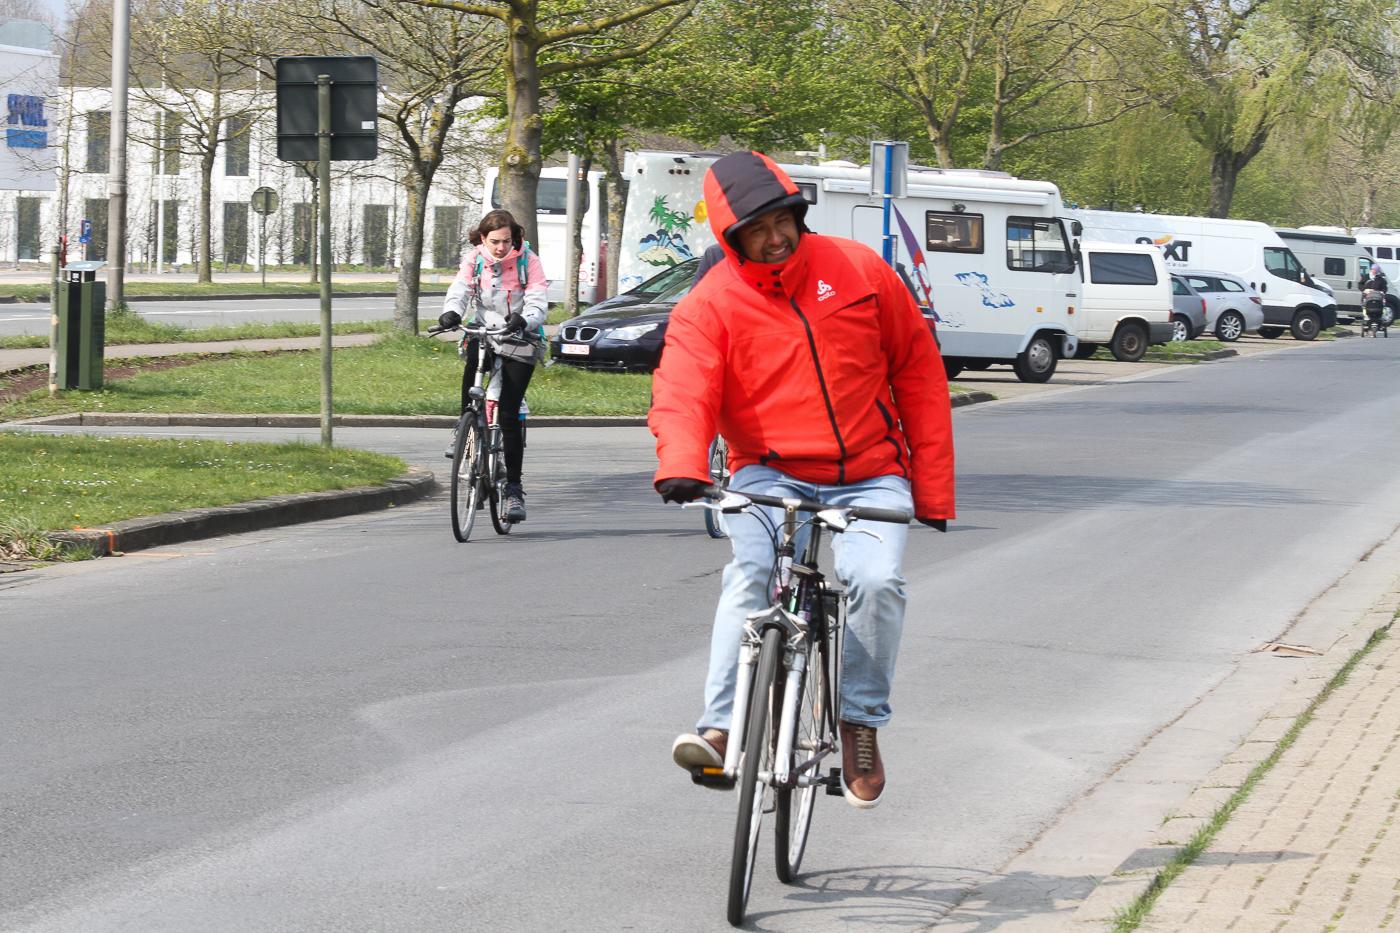 RCT_Gent_2019_049.jpg